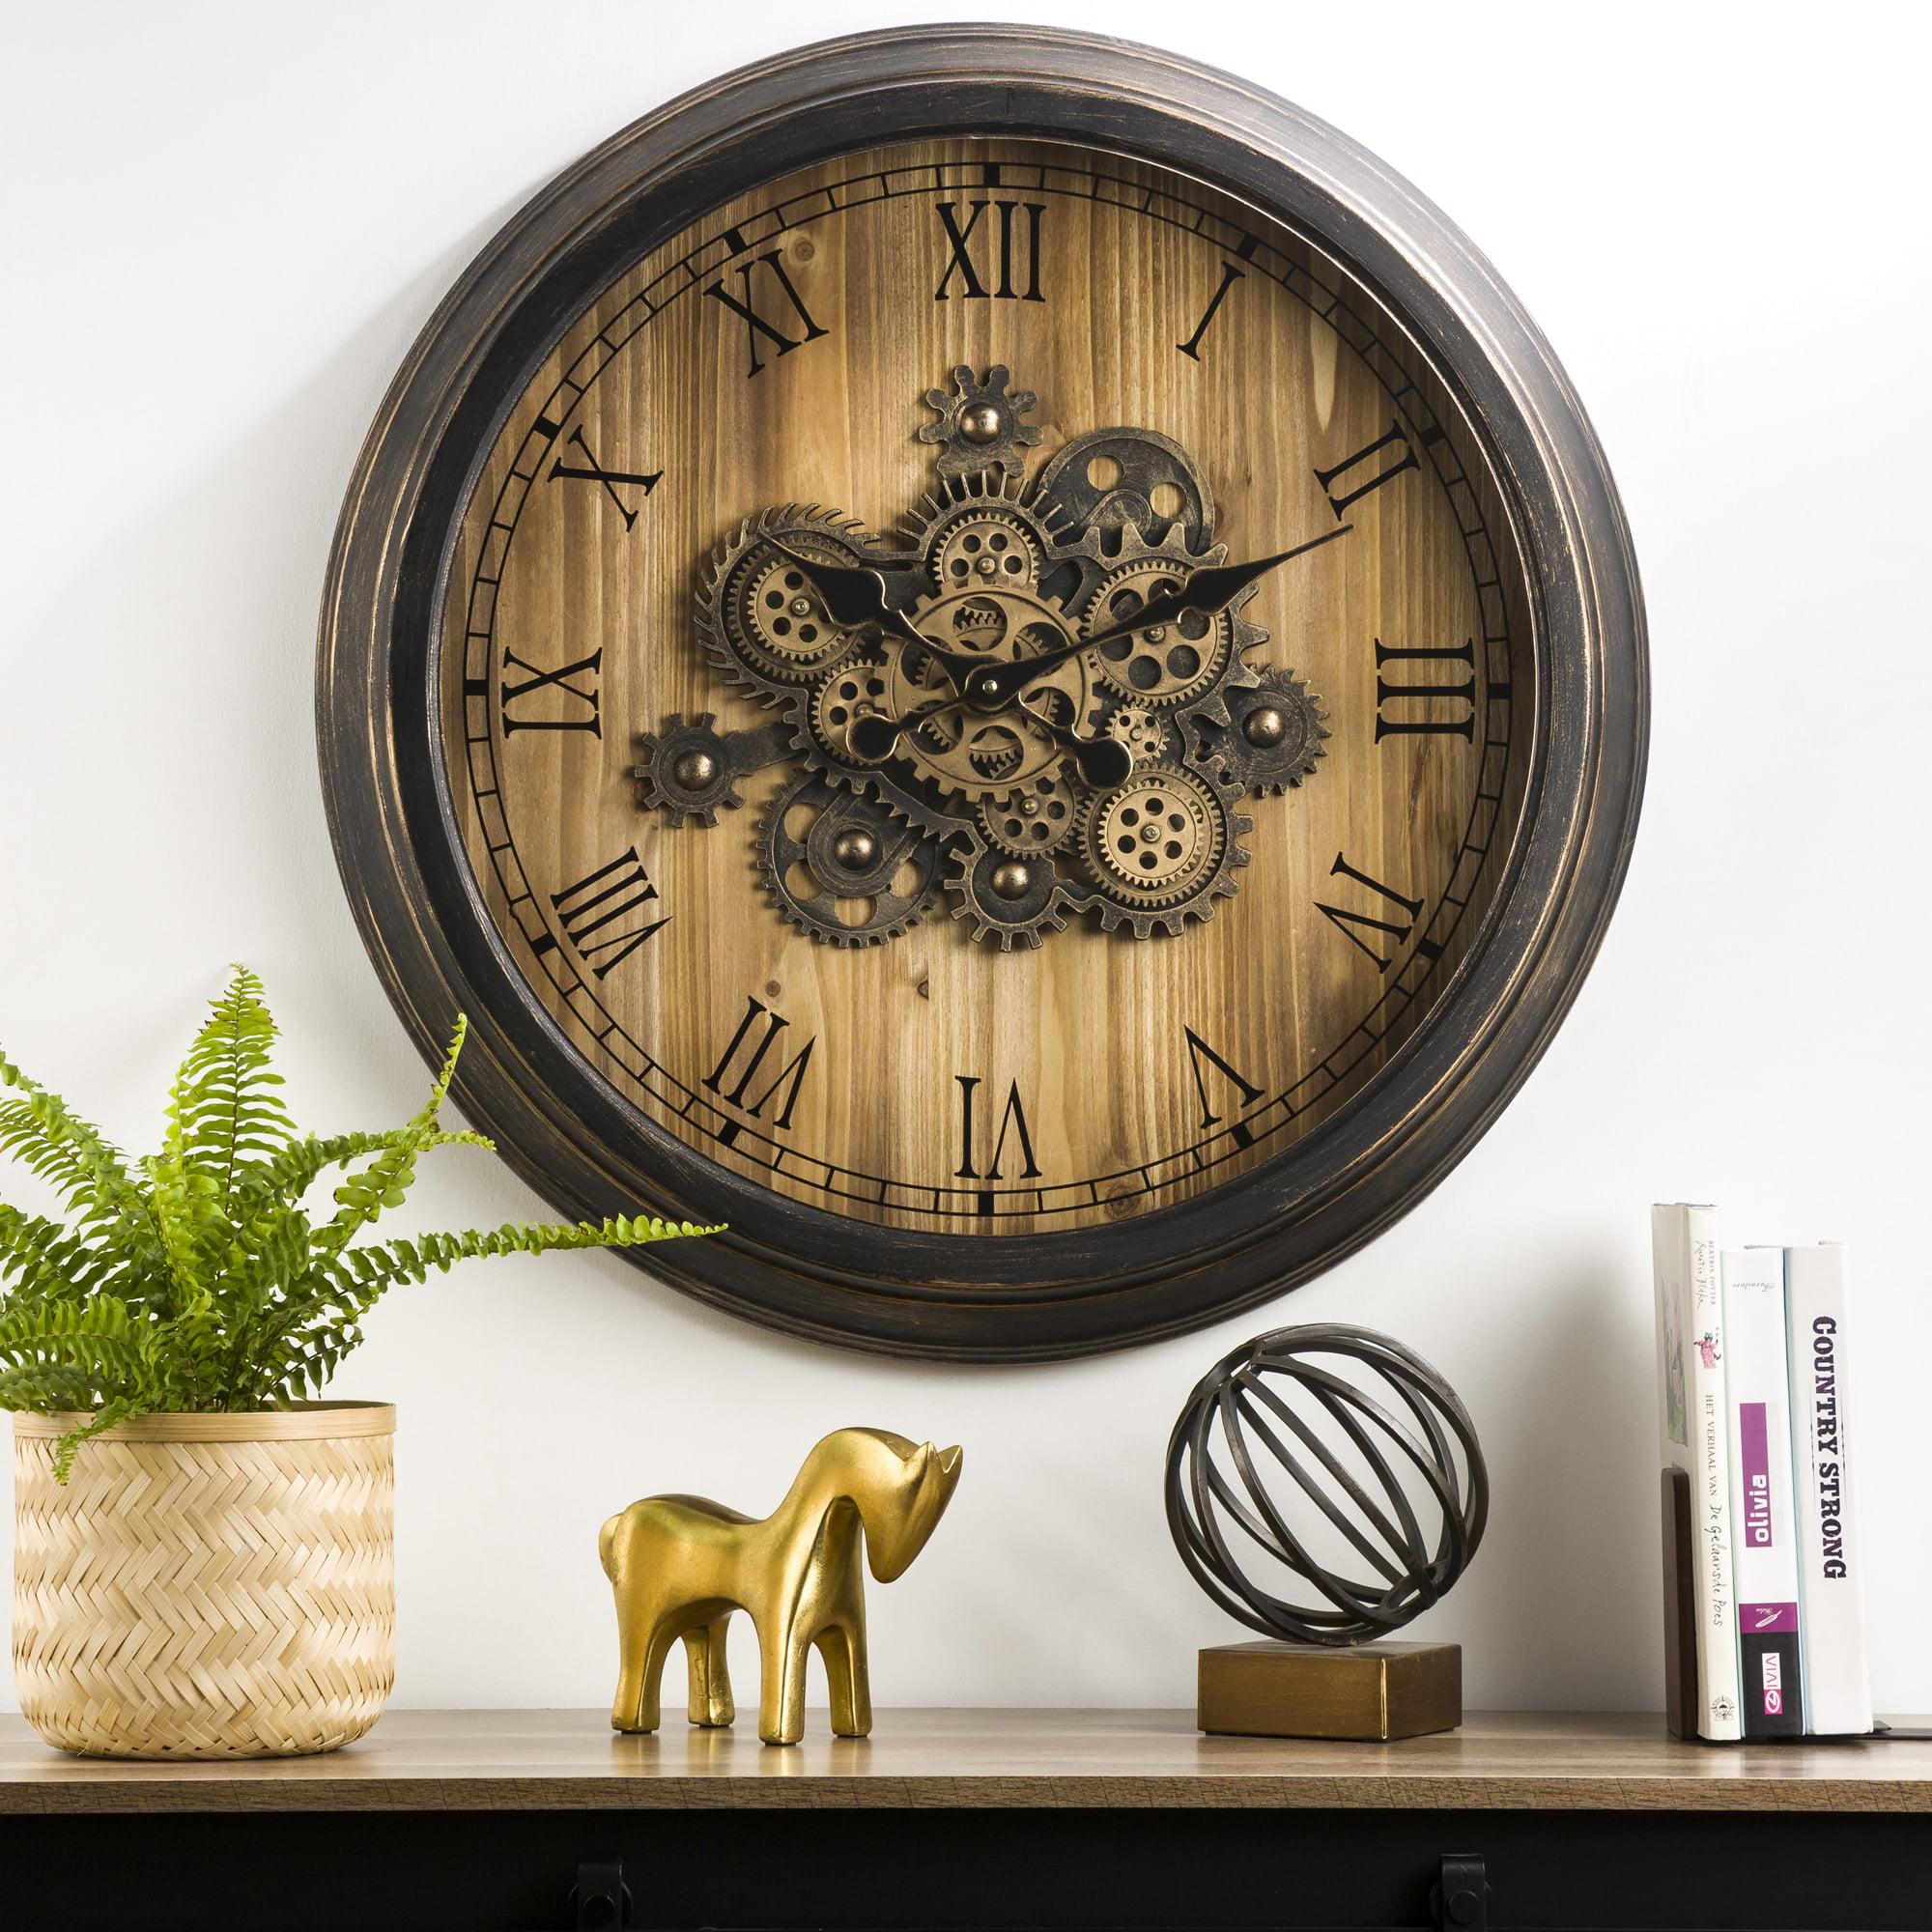 farmhouse decor rustic decor - big clock large clock The Olivia Farmhouse clock rustic clock oversized wall clock